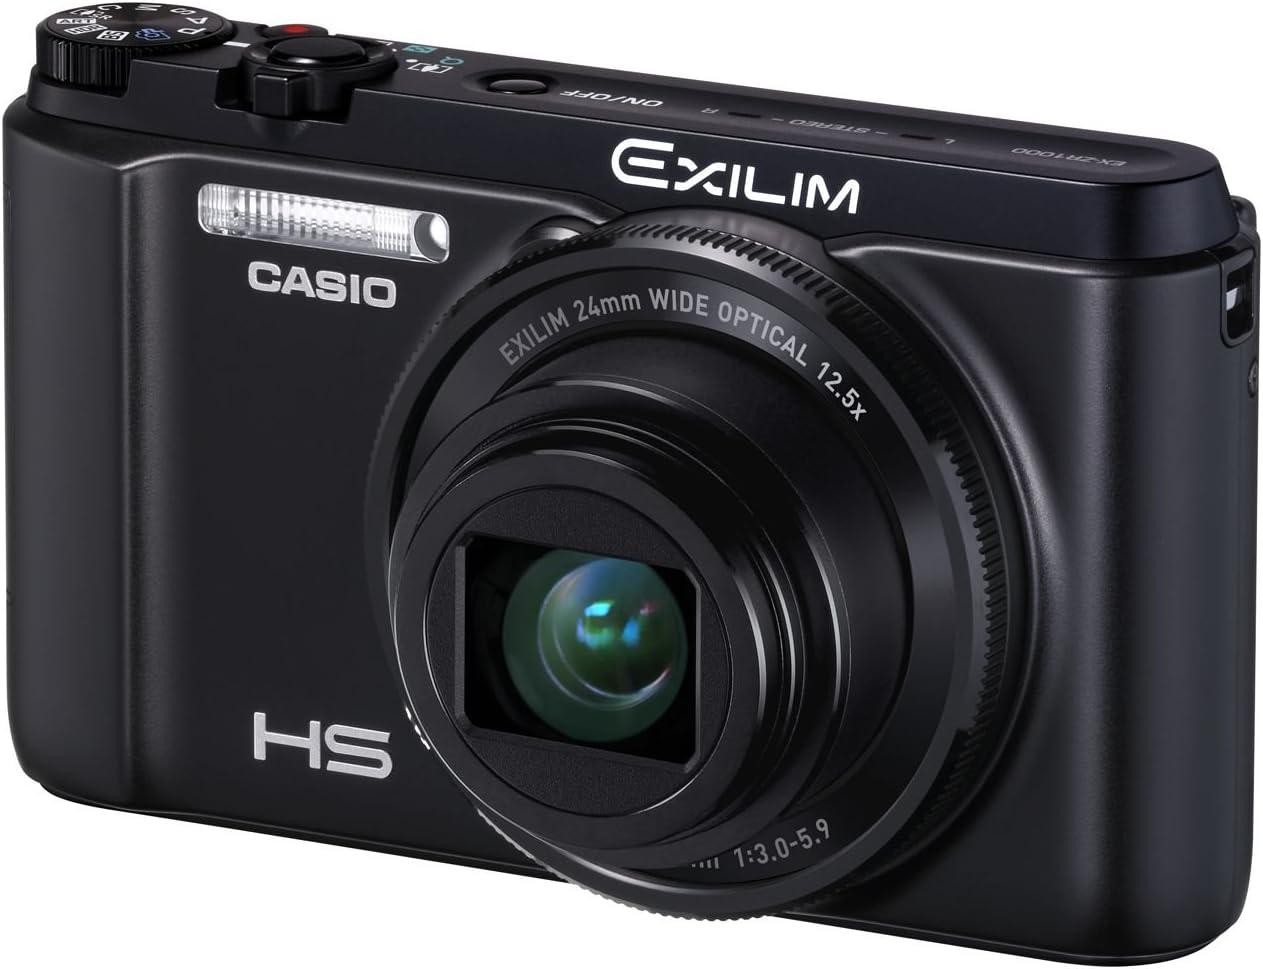 Casio Exilim EX-FH25 Digital Camera Memory Card 2 x 2GB Standard Secure Digital Memory Card SD 1 Twin Pack